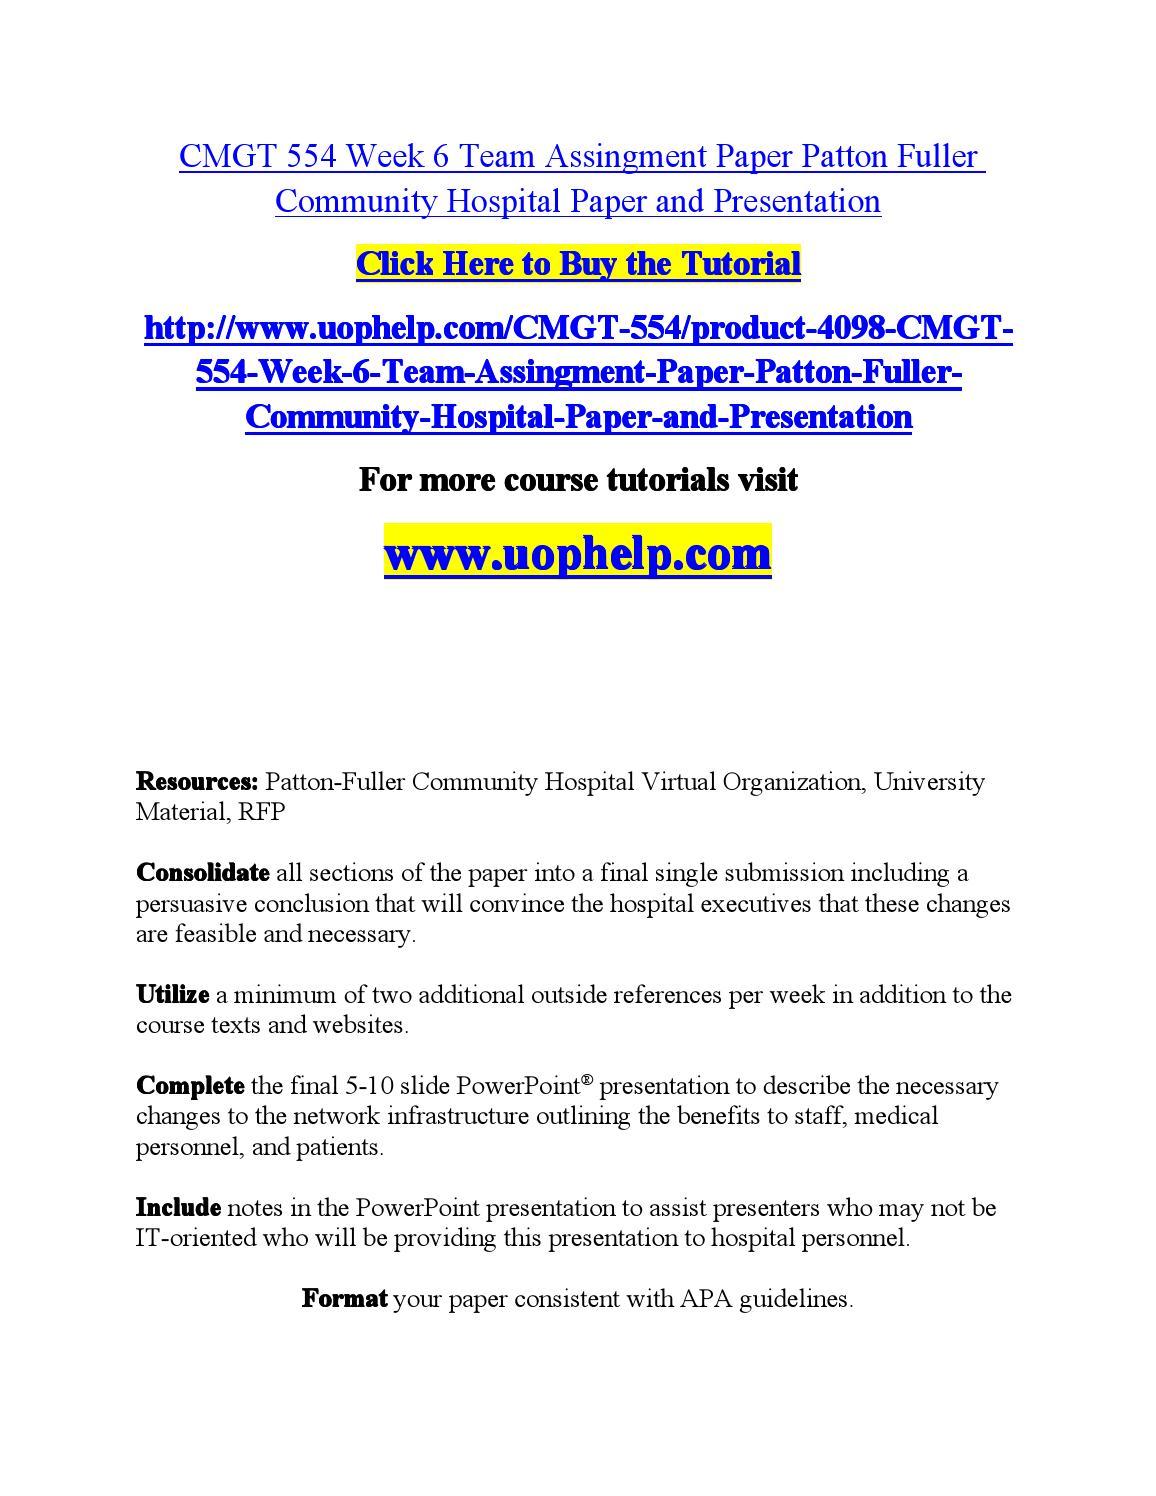 patton fuller community hospital virtual organization